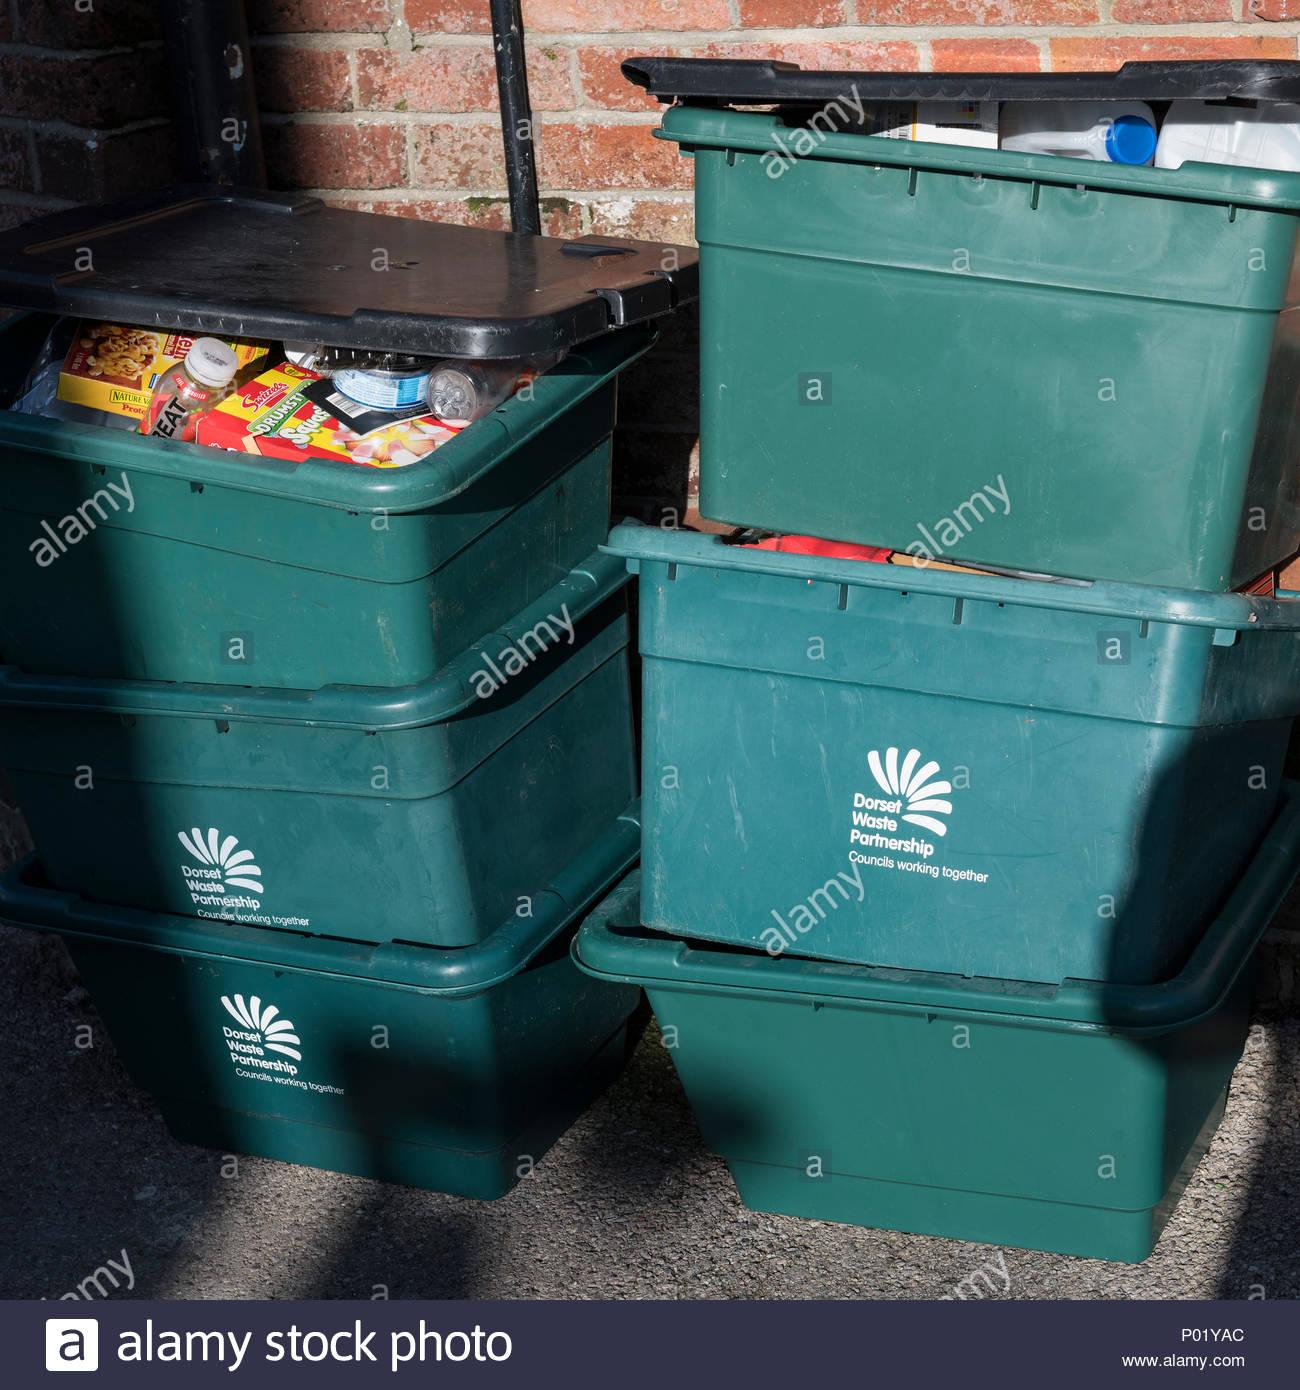 Recycling boxes, Blandford, Dorset, England, UK Stock Photo